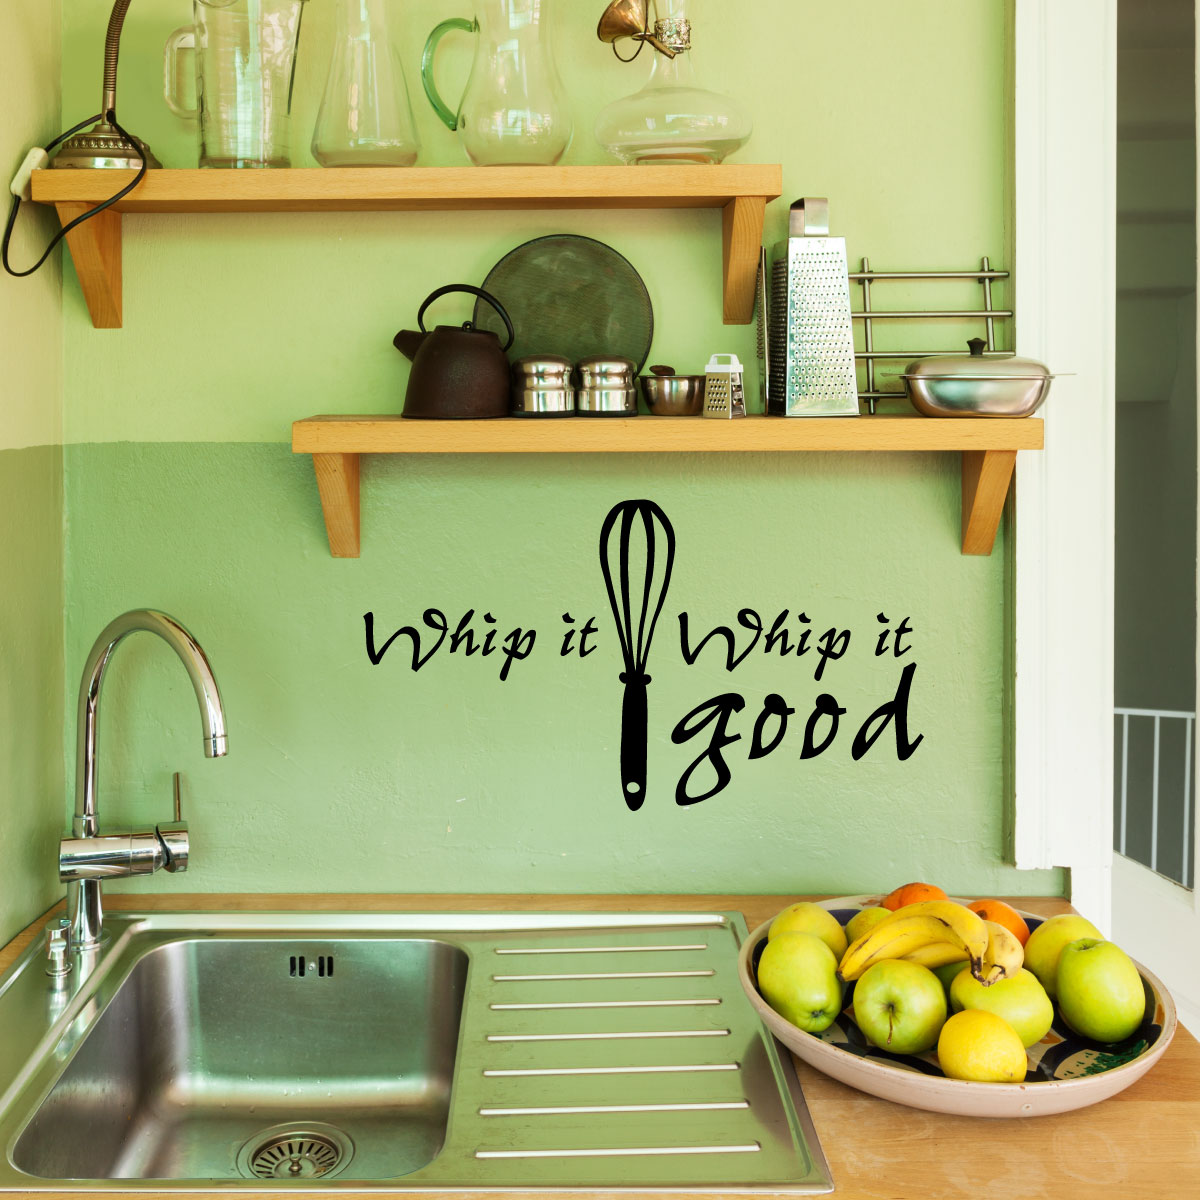 stickers muraux pour la cuisine sticker fouetter ambiance. Black Bedroom Furniture Sets. Home Design Ideas